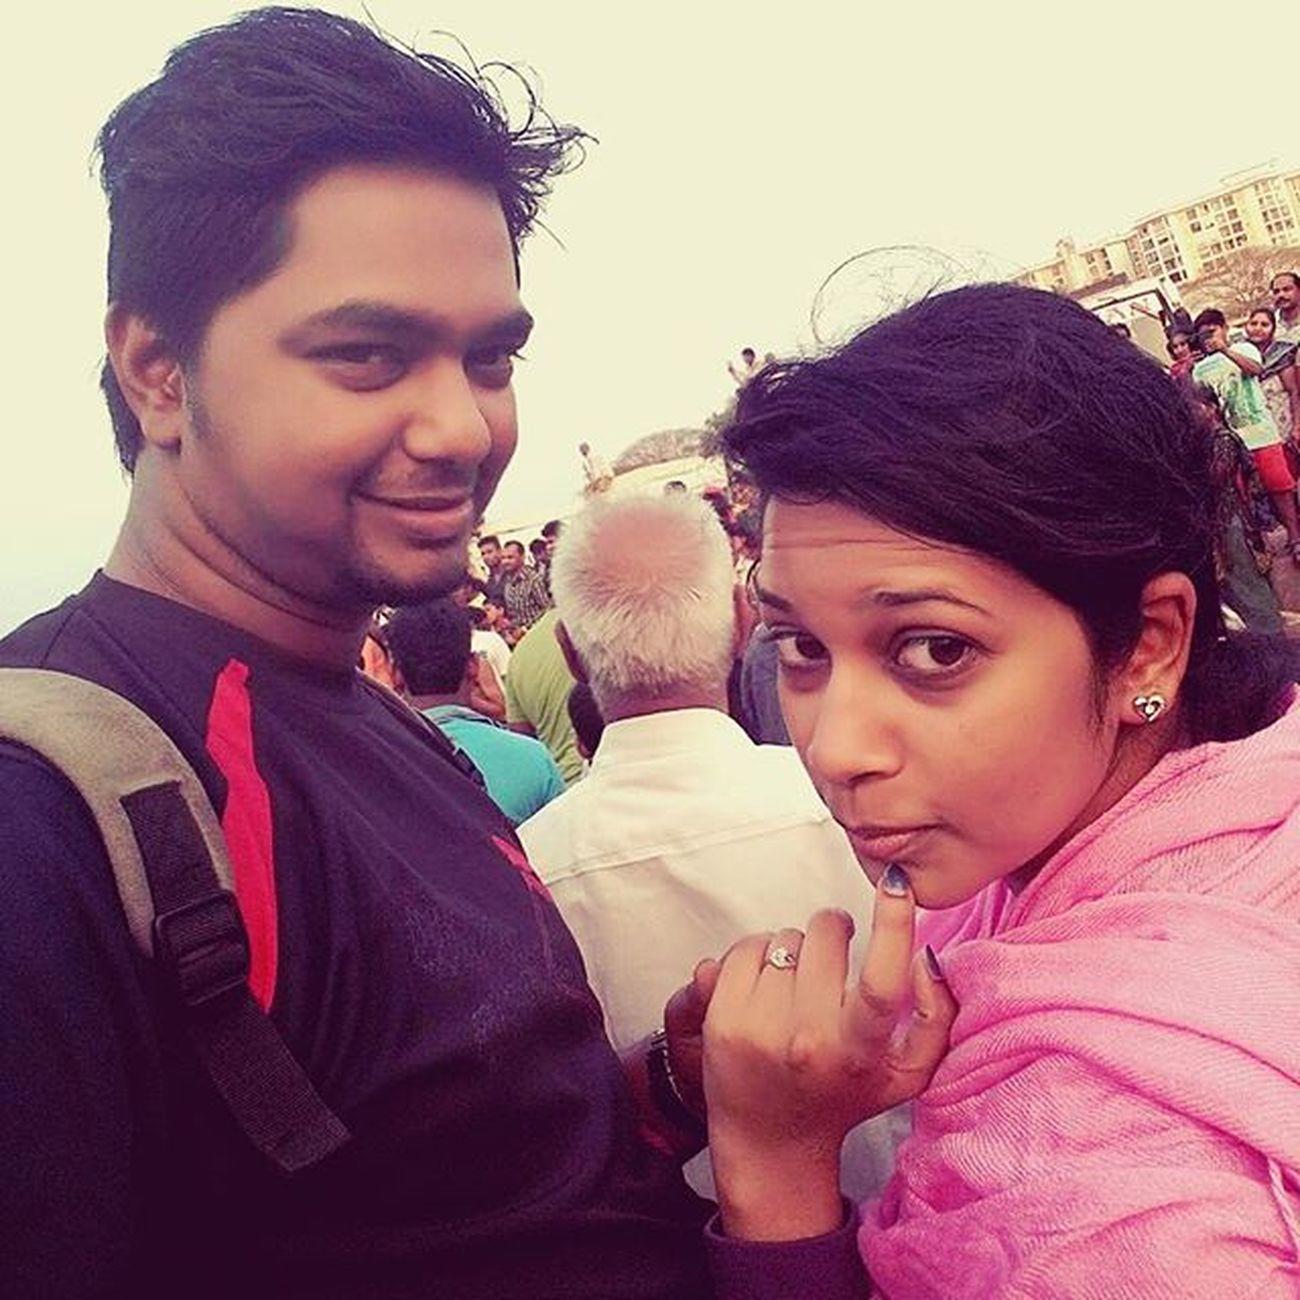 India Goa Instapic Instaedit Instagood Instalike Tagsforlikes Tagsforshare Carnival Kuku Mylove Forever Cute Lovehimsomuch Pose Selfie